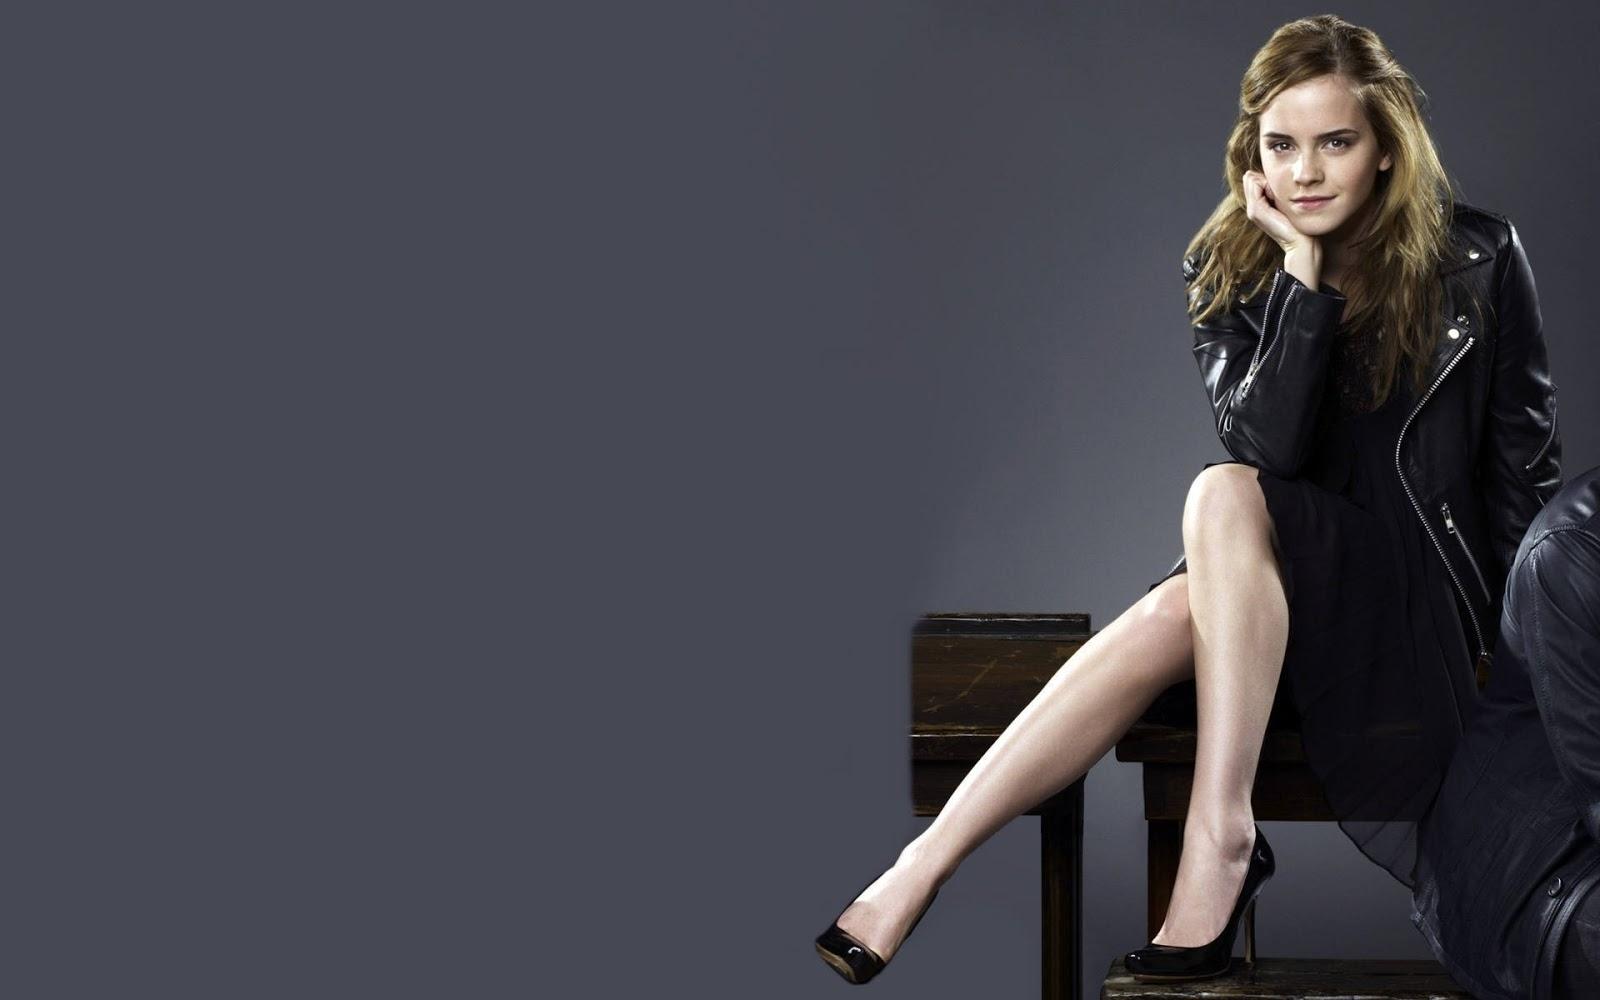 hollywood stars: emma watson new hd wallpapers 2013